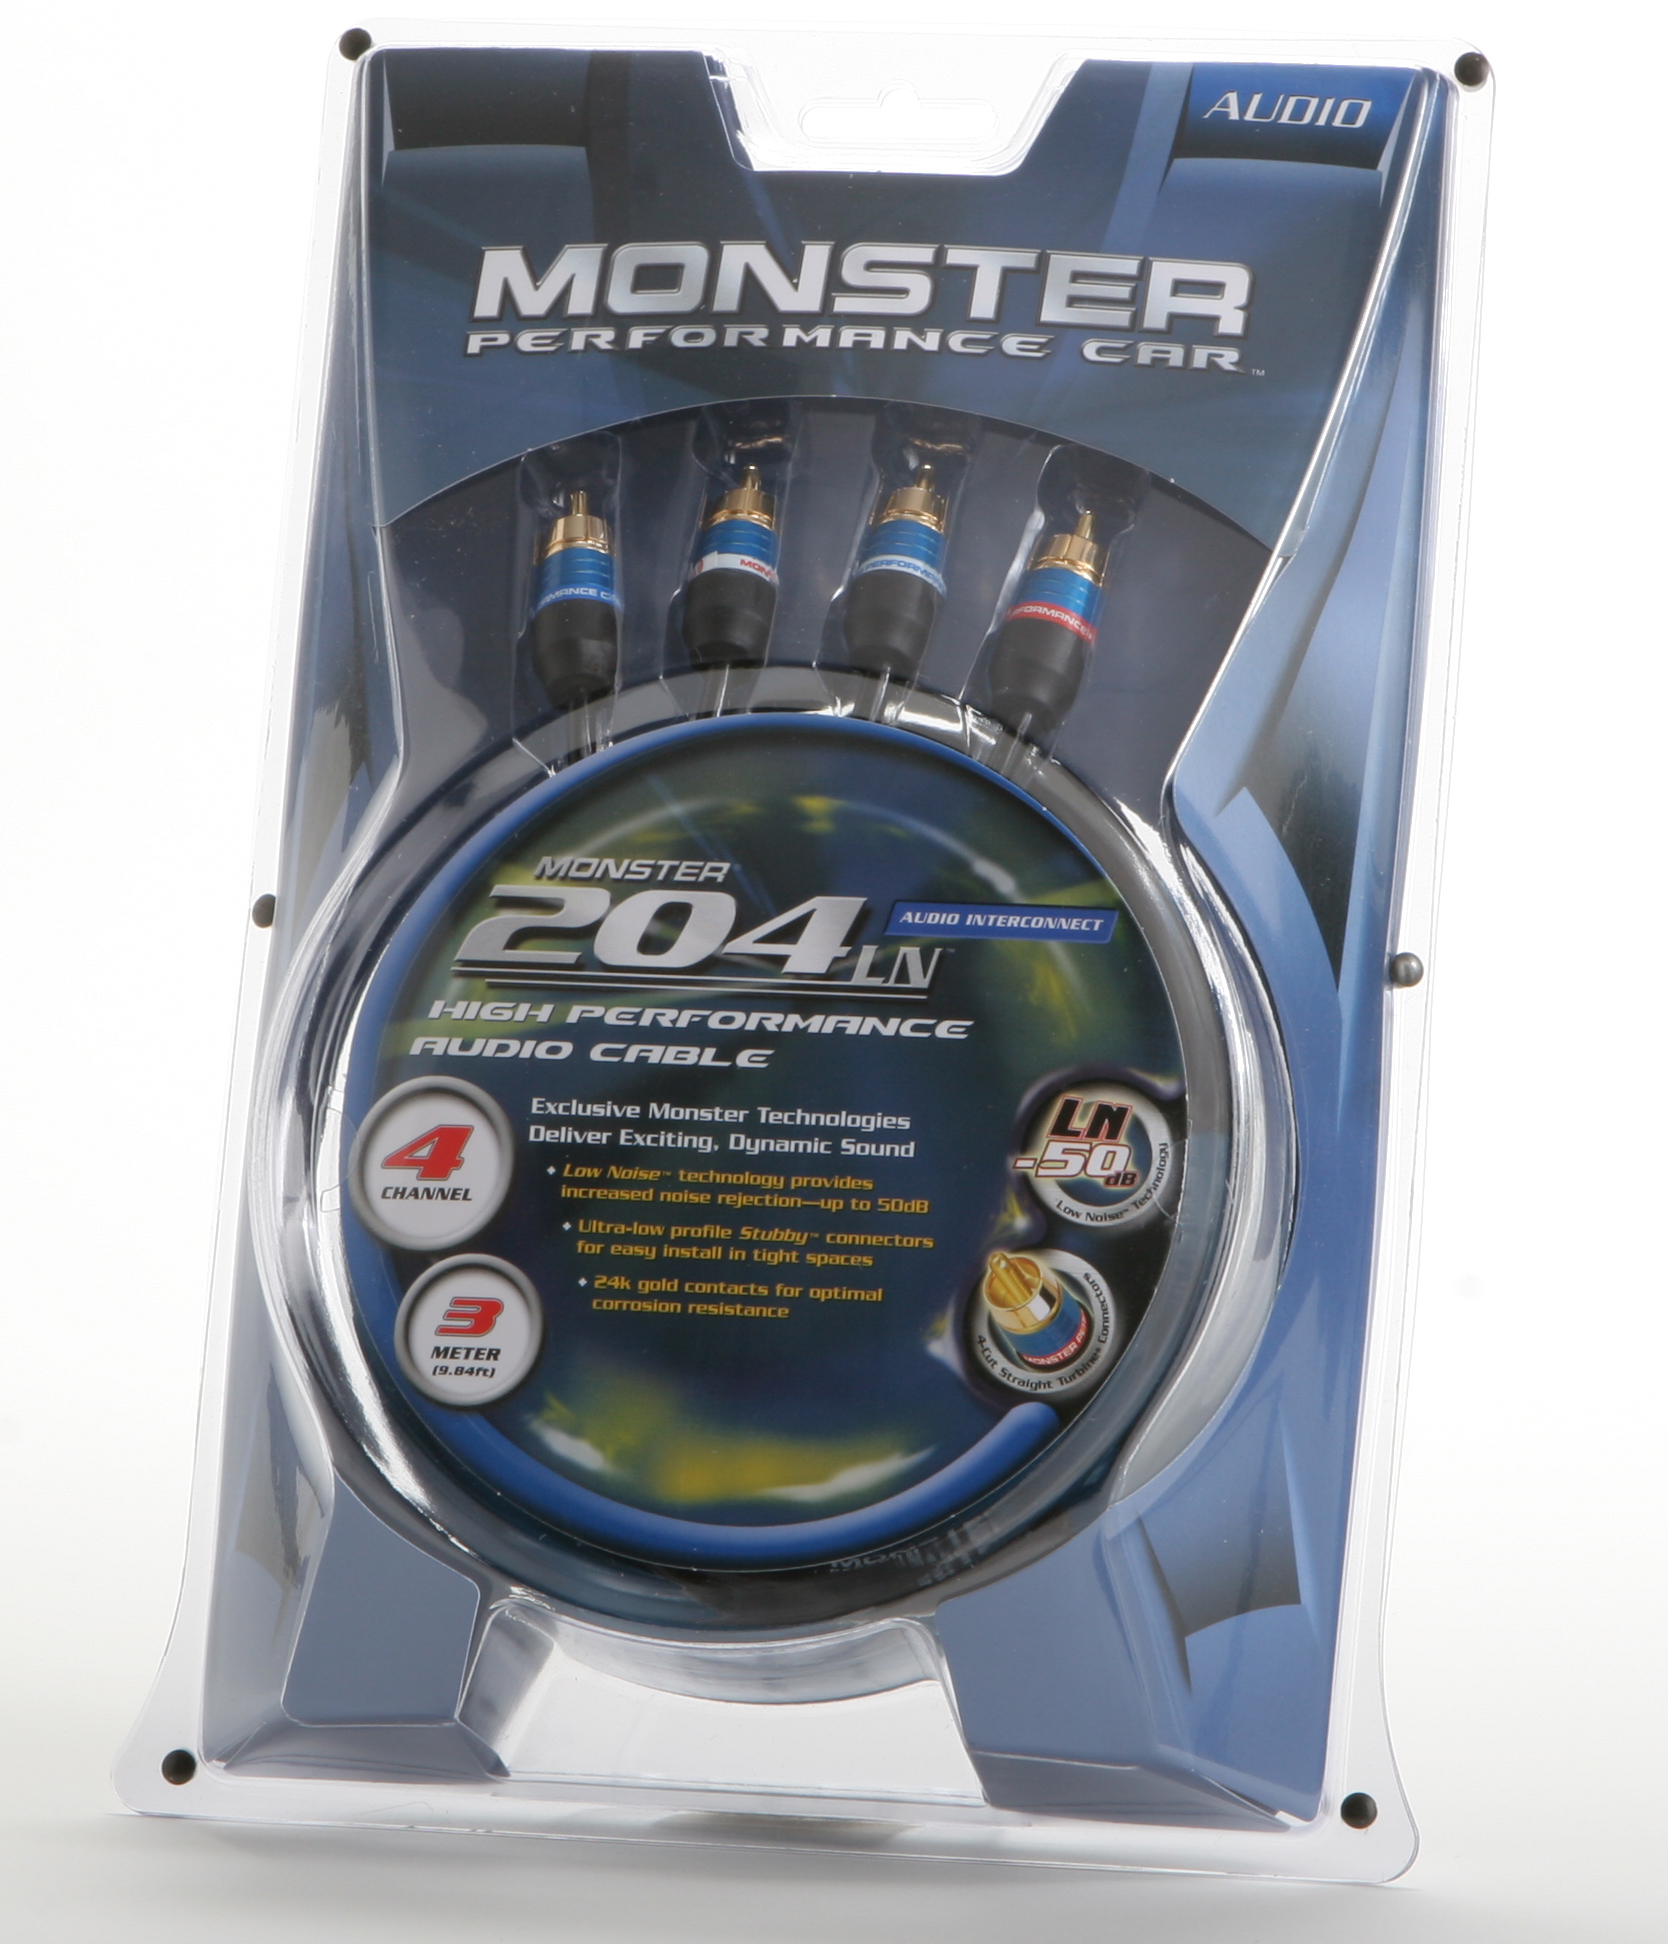 MonsterMPC.jpg